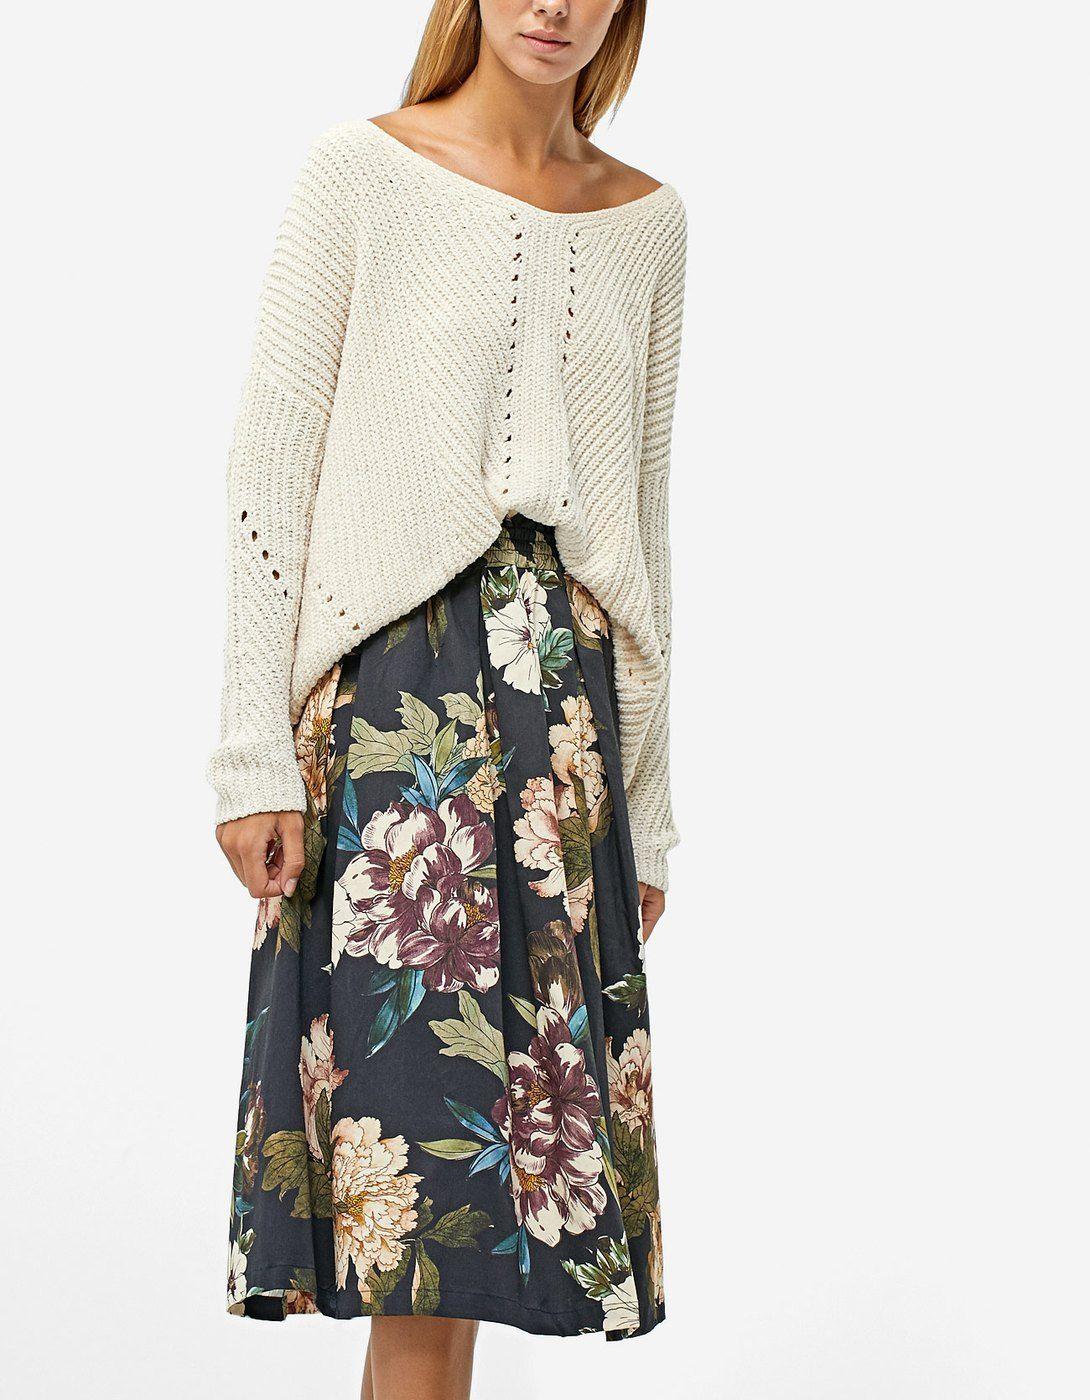 6718ee2bf7 Printed midi skirt - Dresses